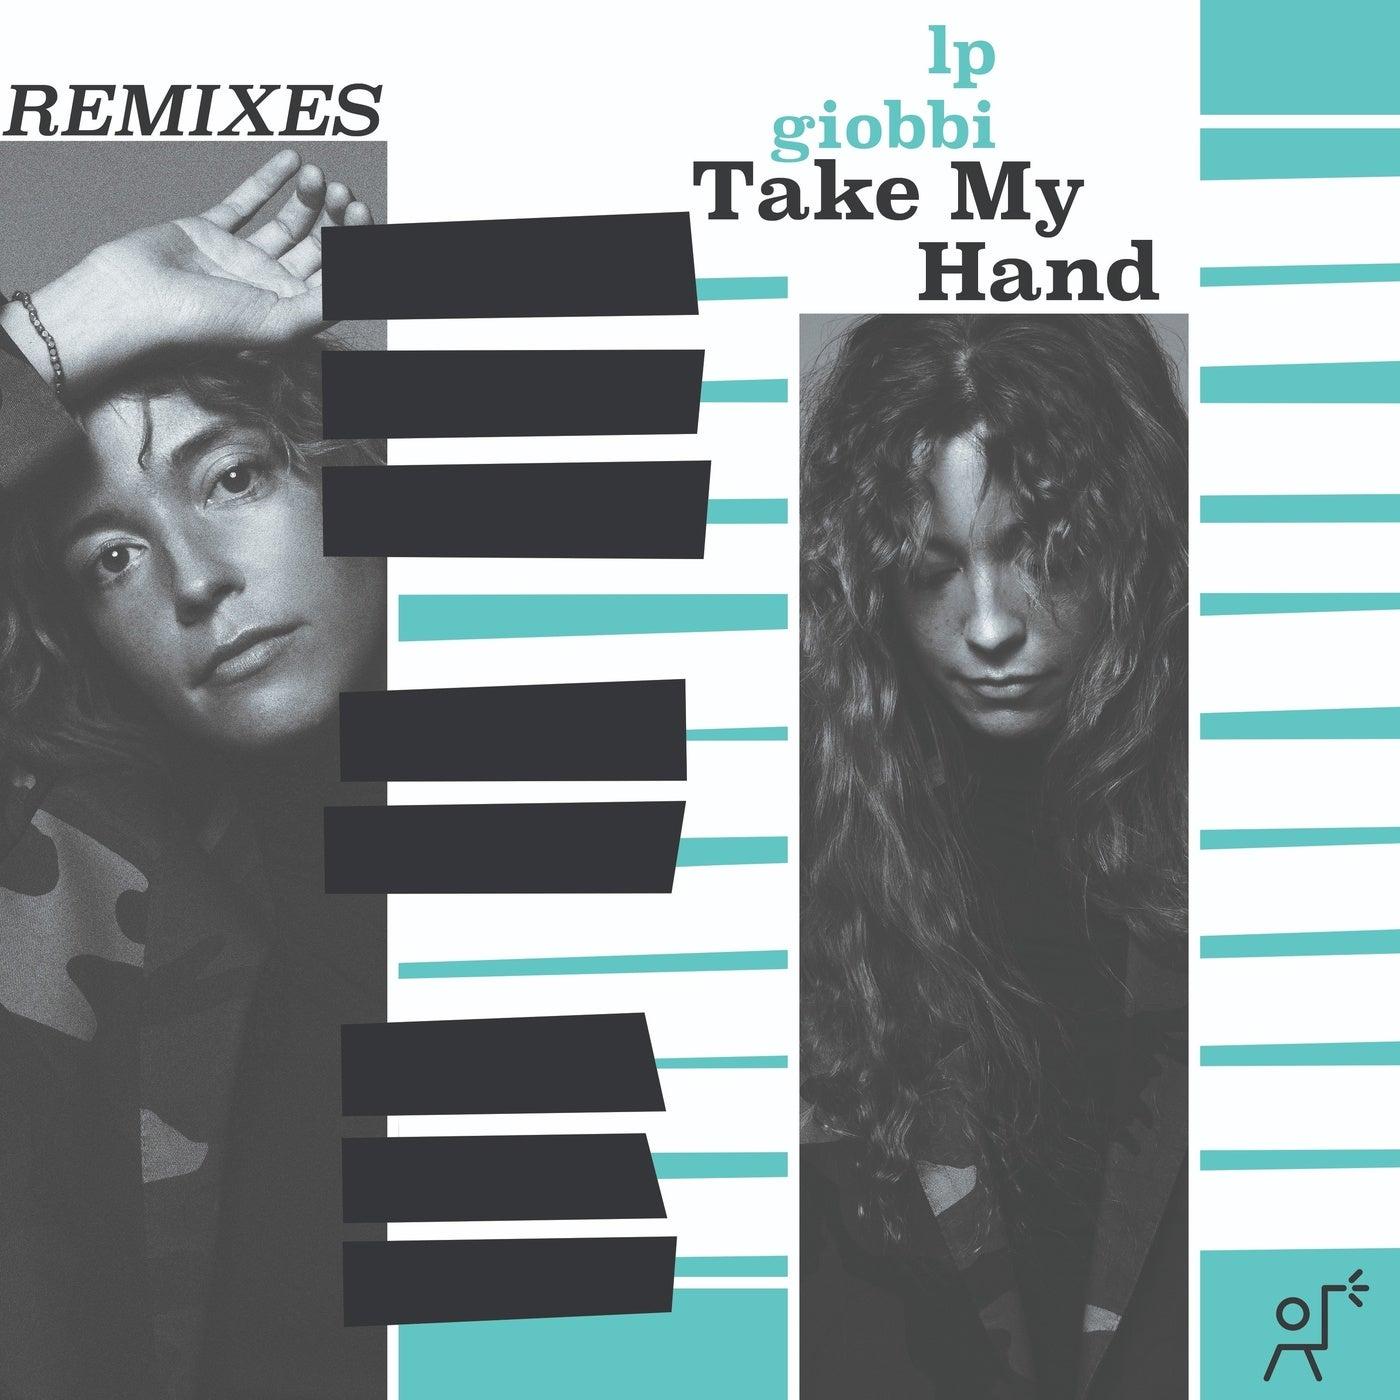 Take My Hand (Walker & Royce Remix) - Extended Mix (Original Mix)